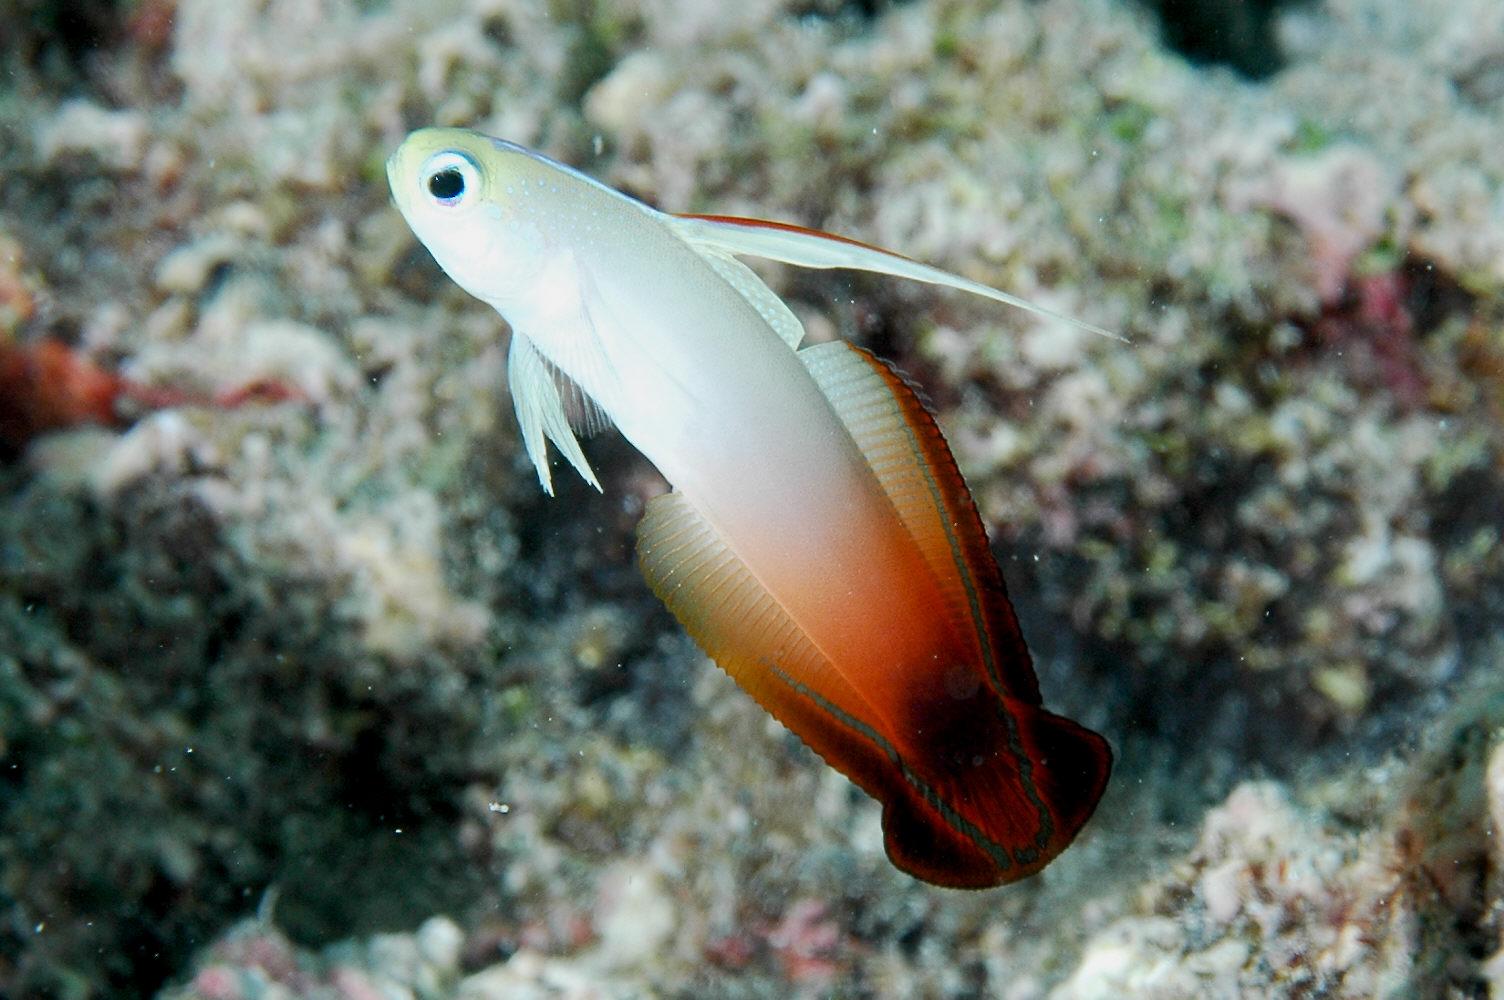 Dartfishes swin long wallpaper